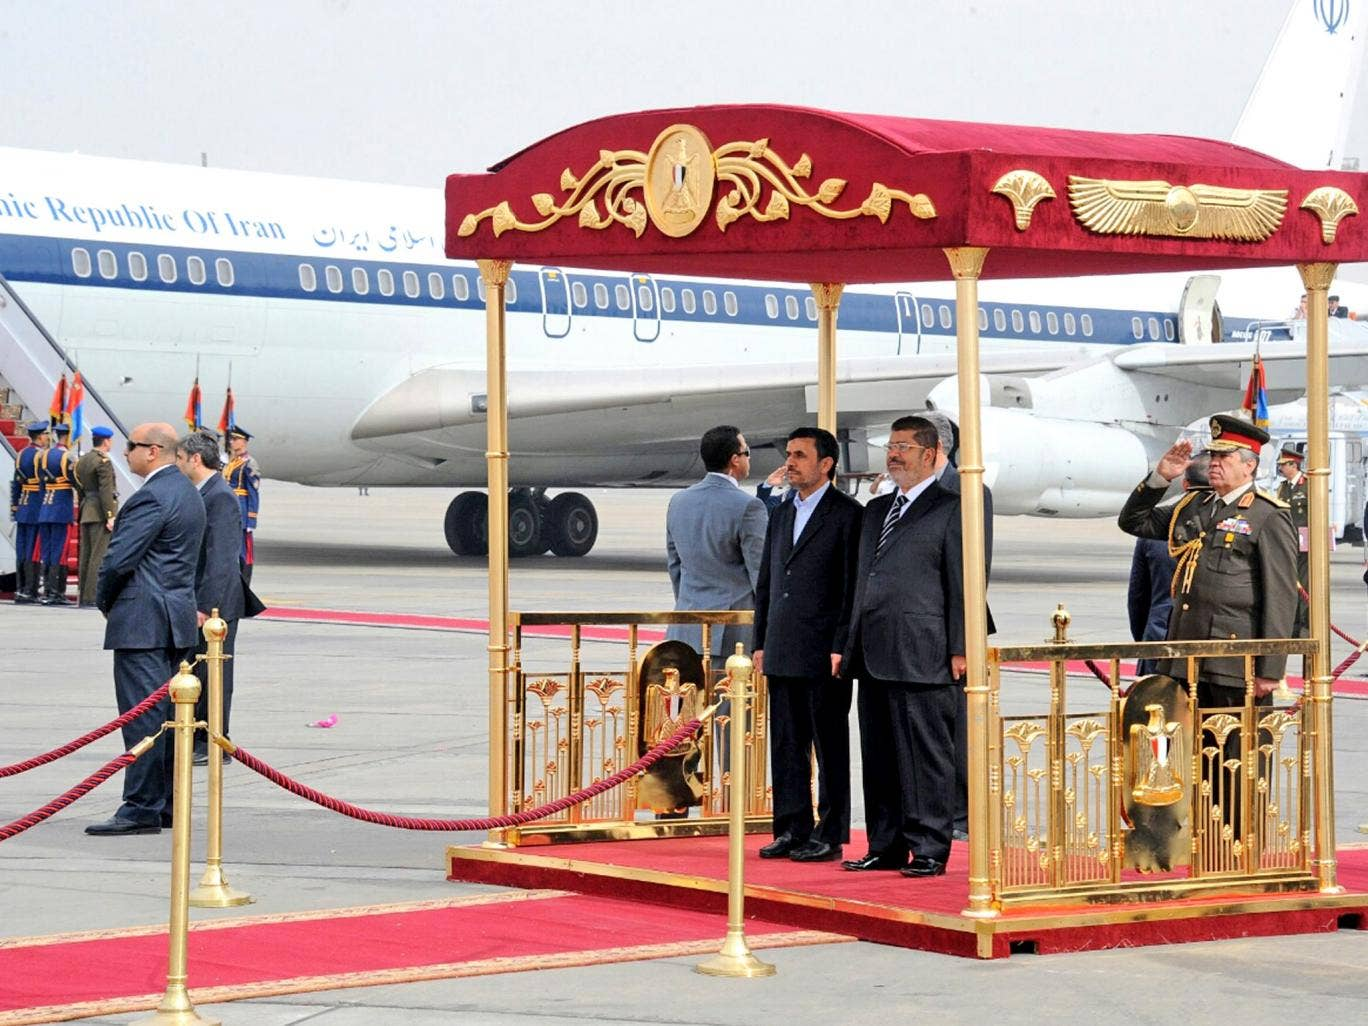 President Ahmadinejad, centre, with President Morsi